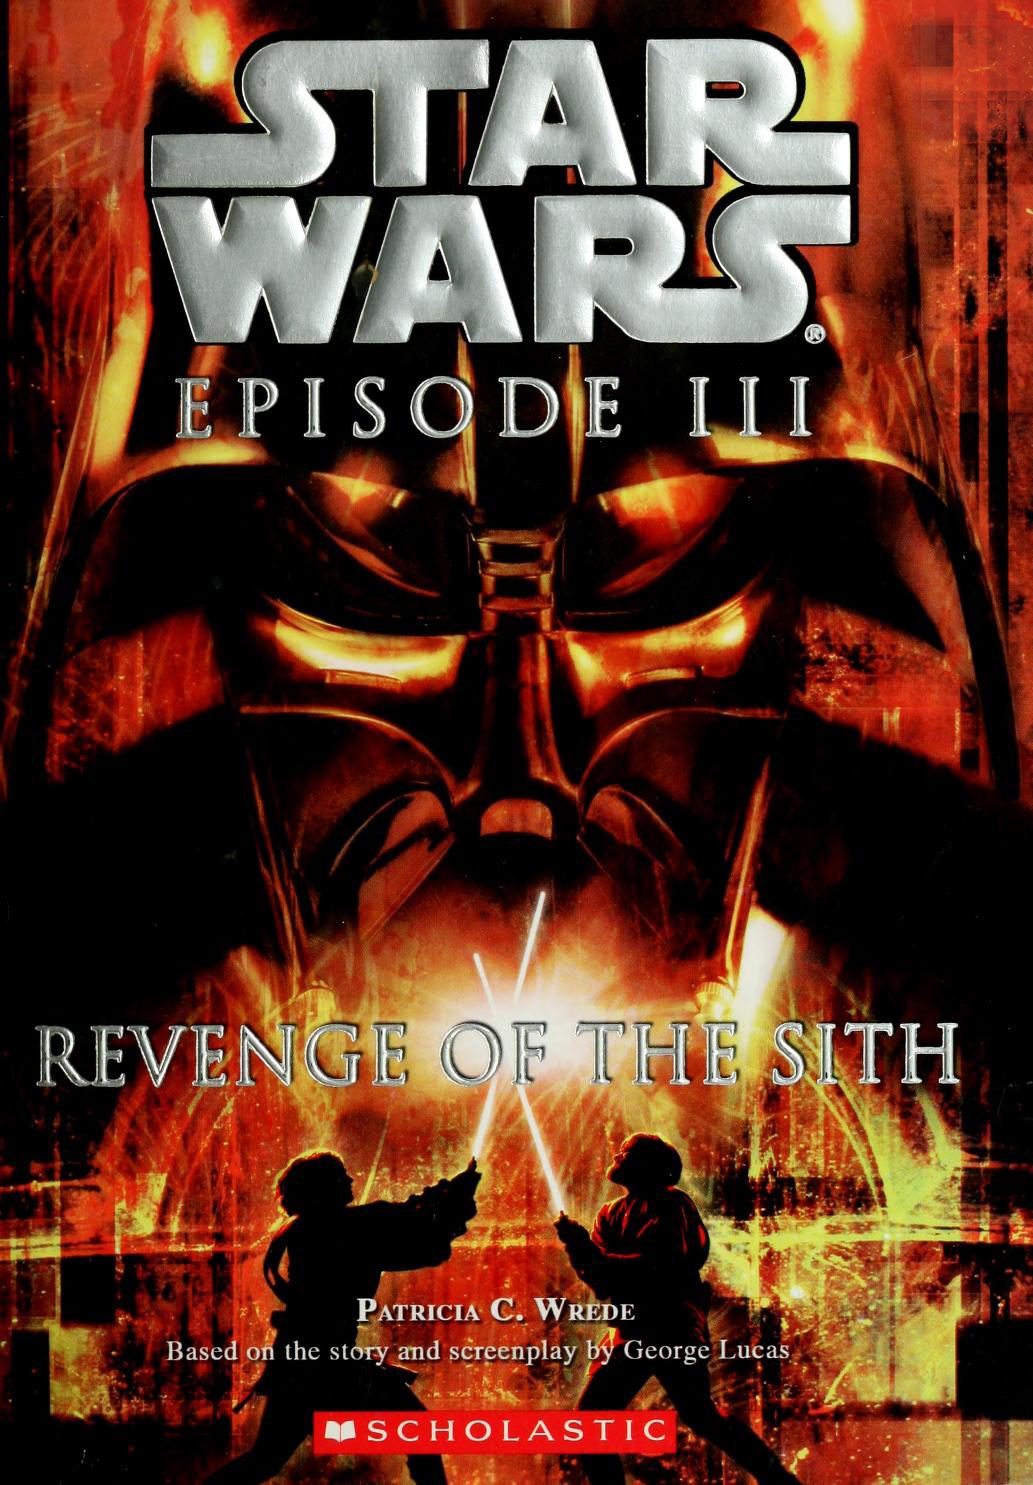 Amazon.com: Star Wars Episode III Revenge of the Sith ...